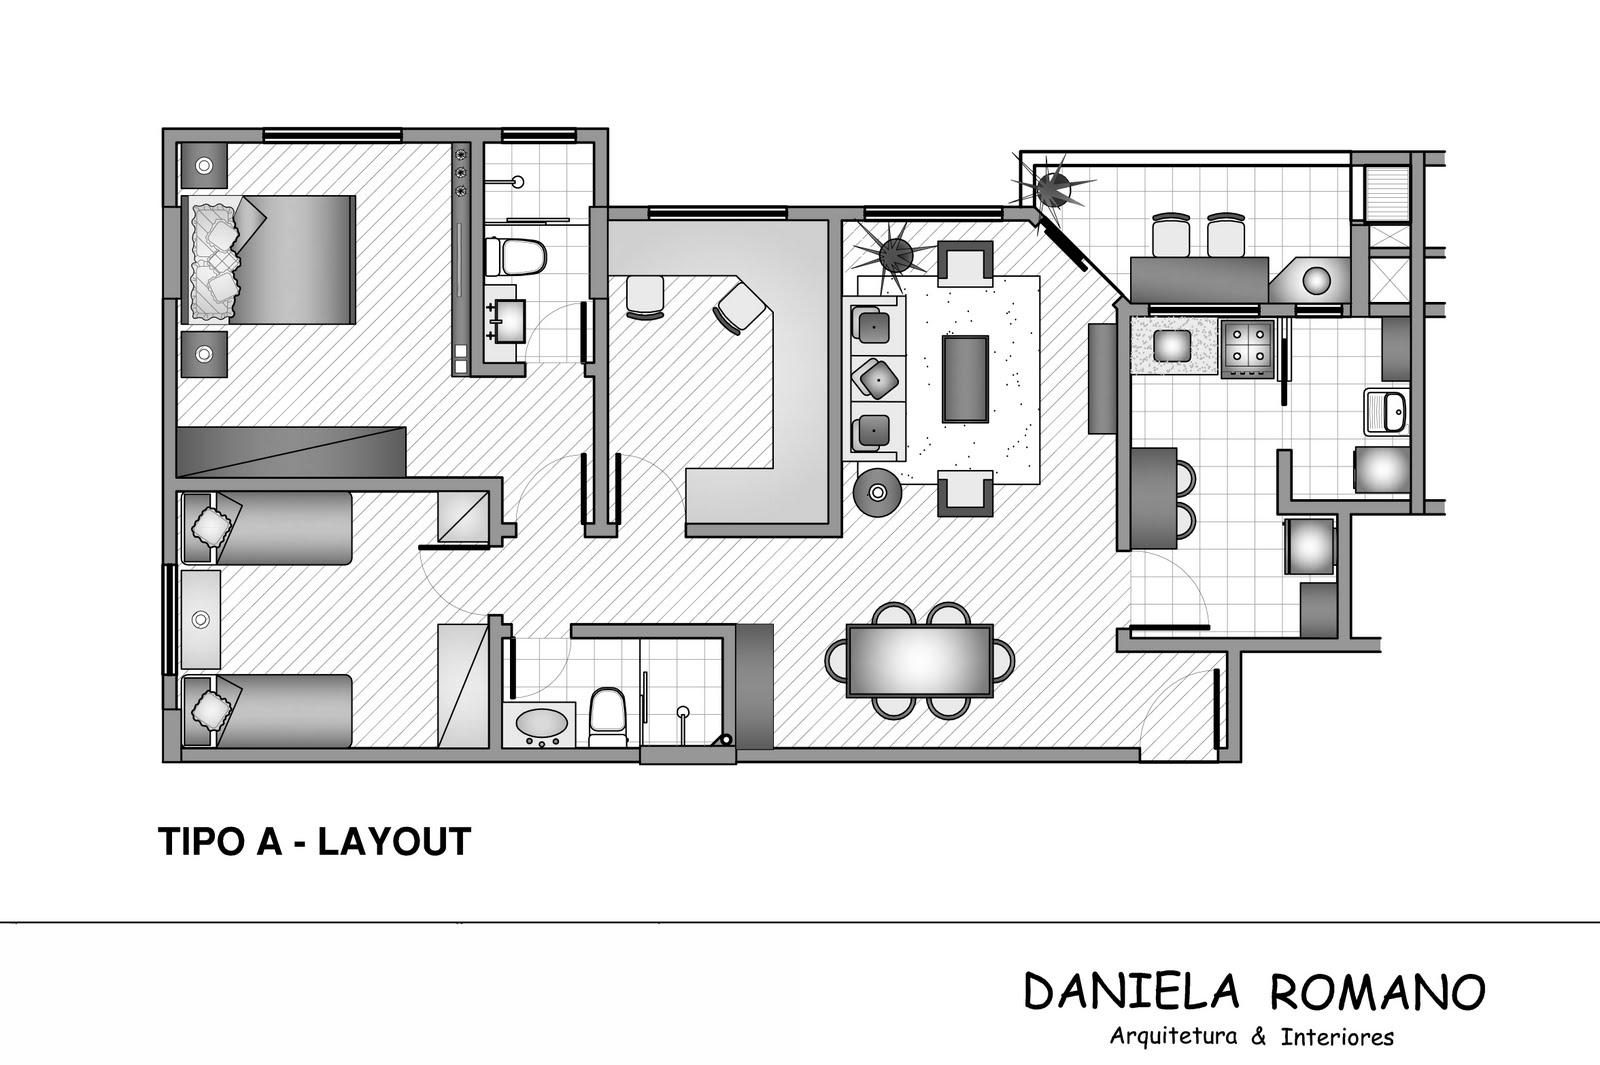 #3B3B3B MARIANA PROJETISTA: Portifólio #08: DANIELA ROMANO 1600x1065 px Projeto De Arquitetura De Cozinha Industrial #2759 imagens